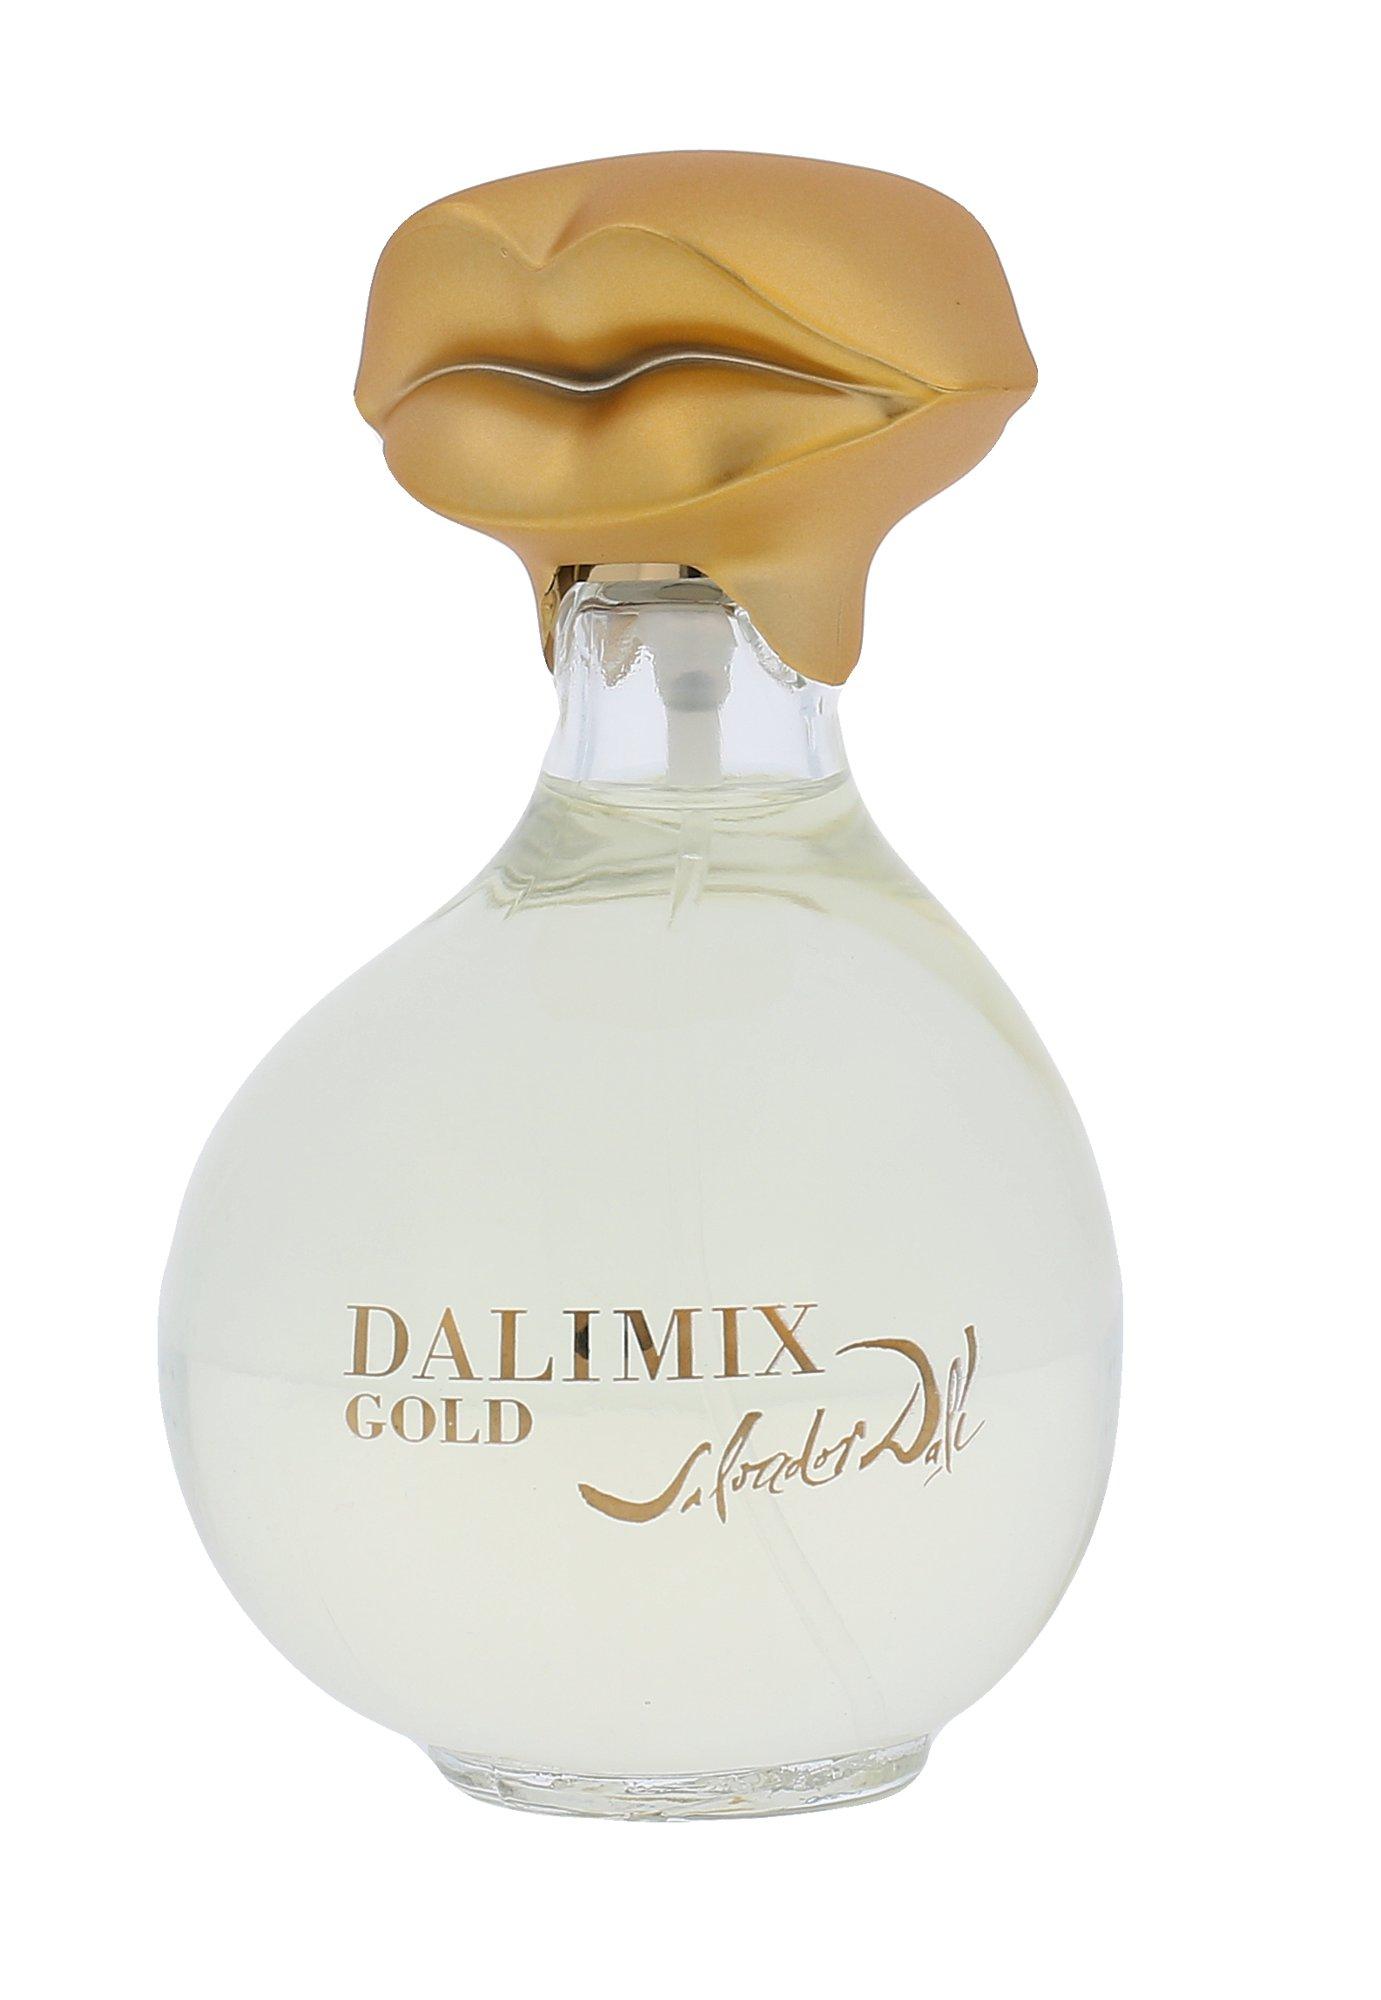 Salvador Dali Dalimix Gold, Toaletní voda 100ml